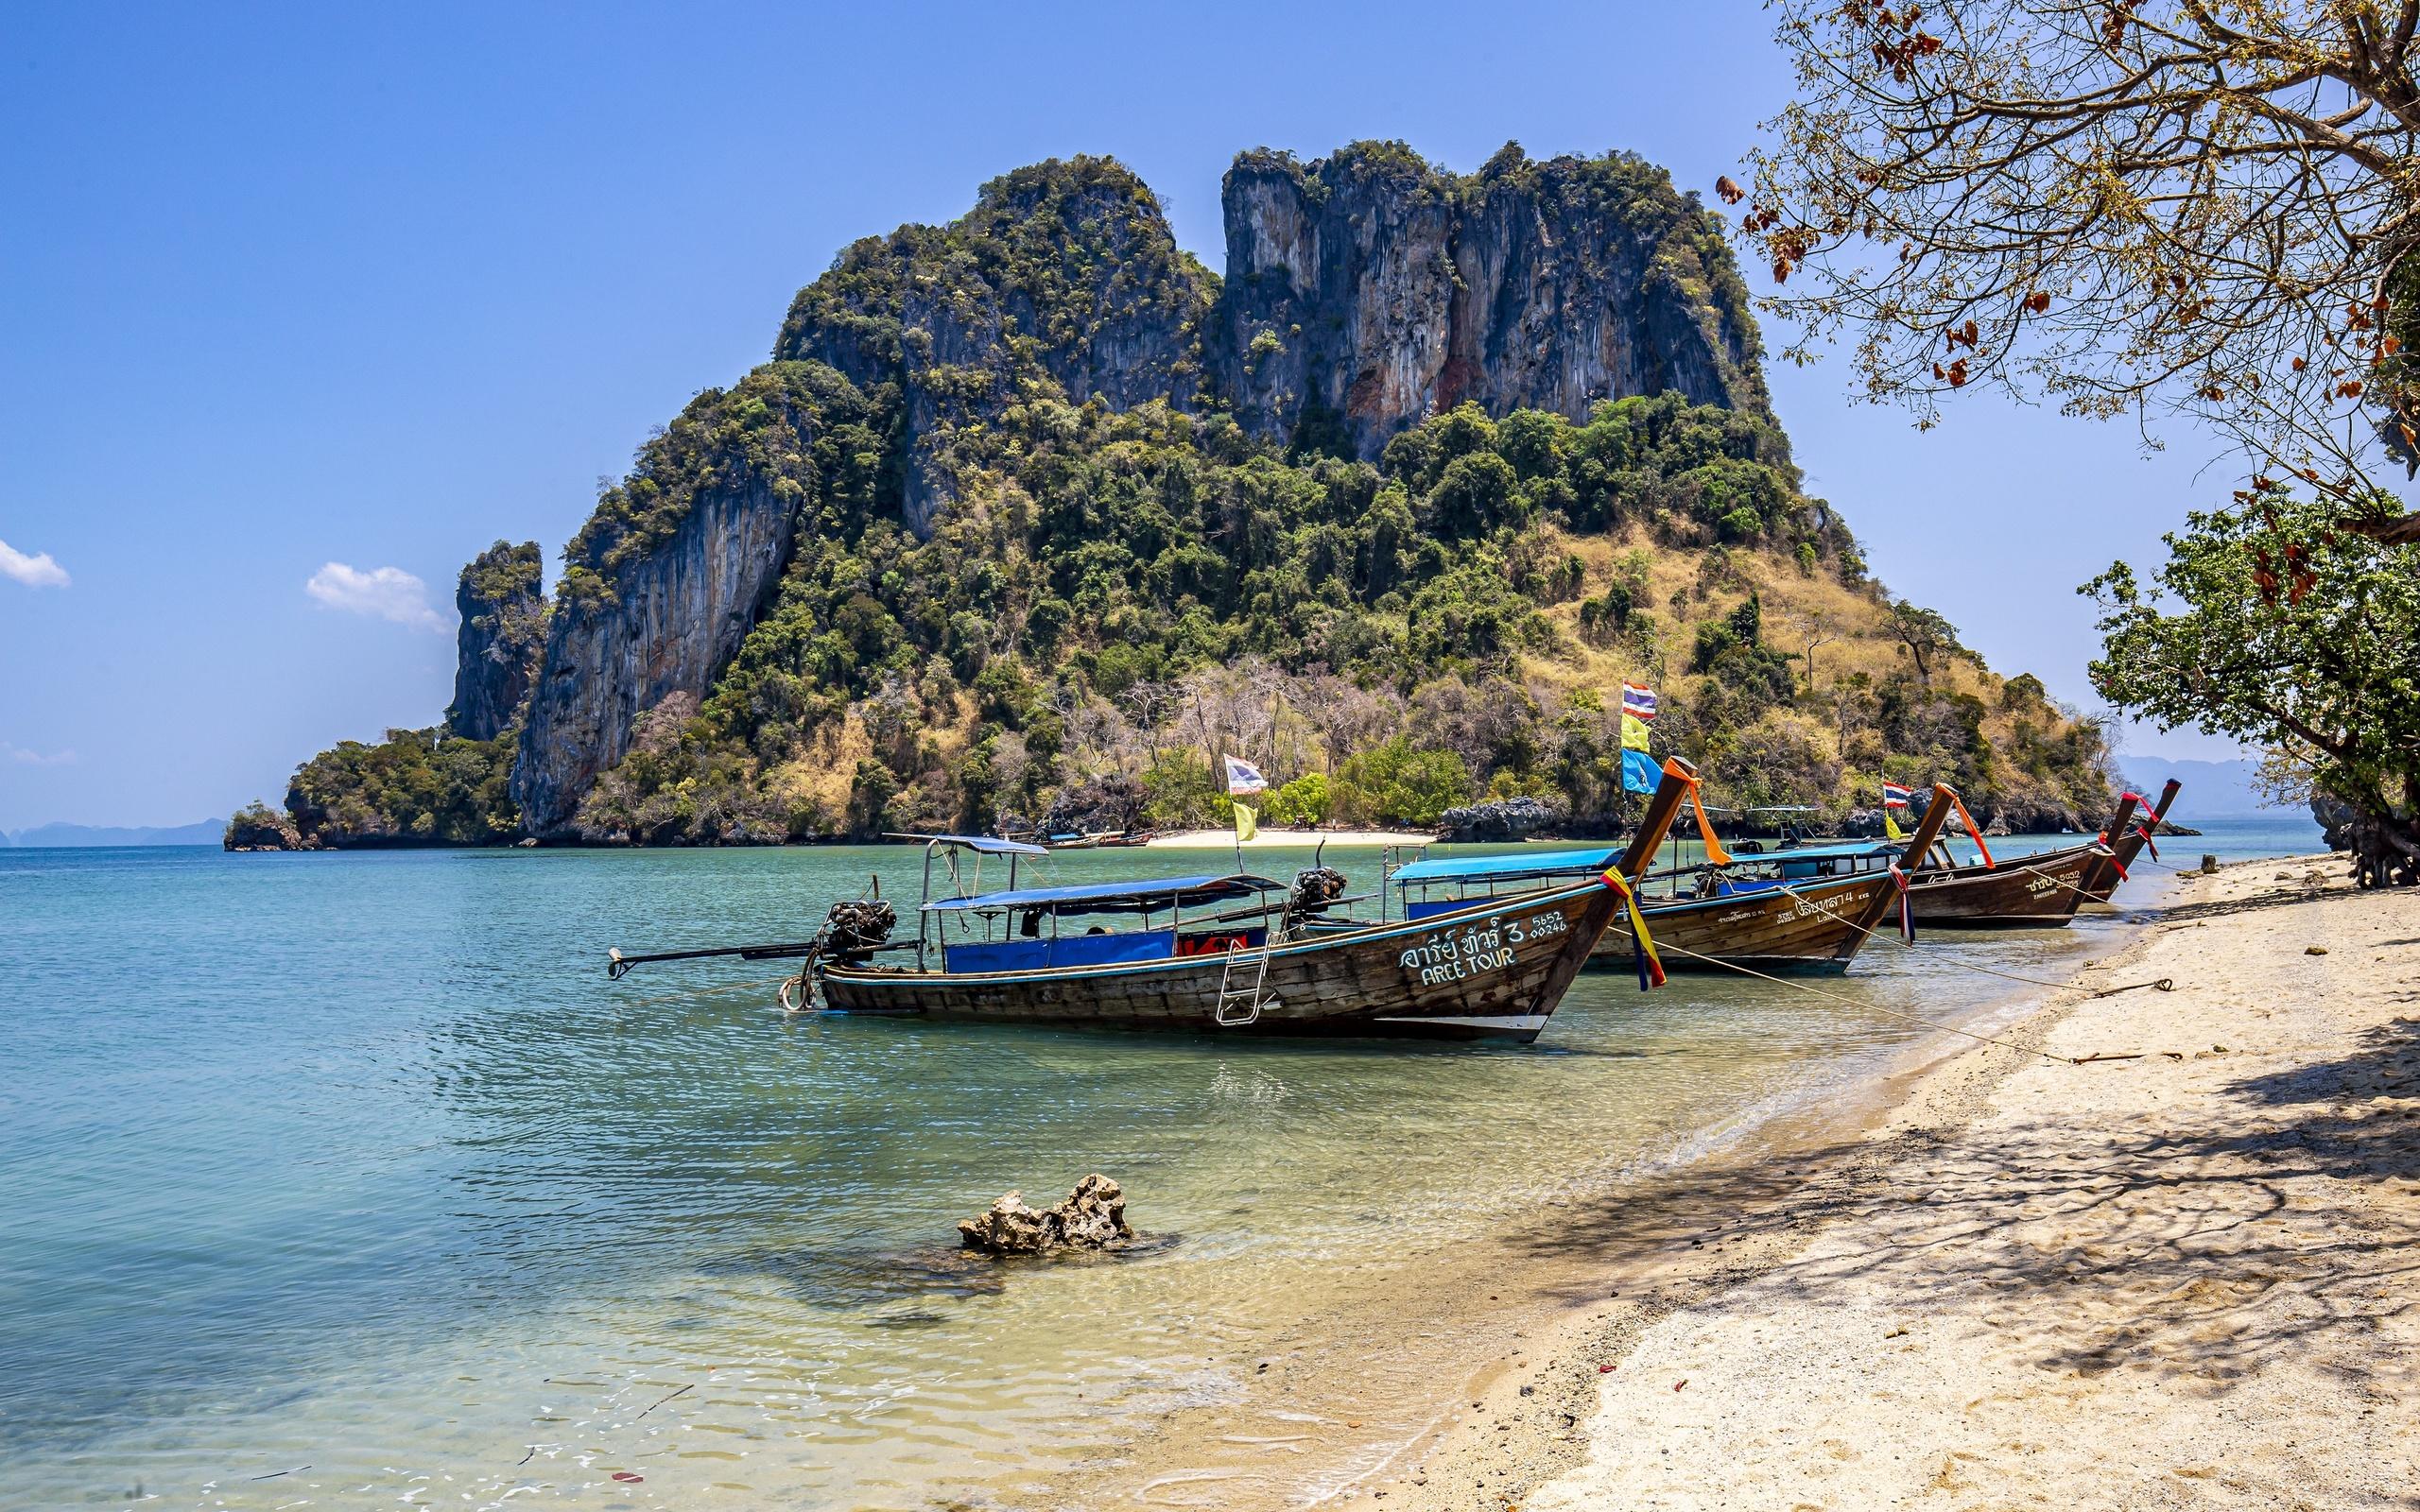 таиланд, остров, лодки, побережье, phuket, природа